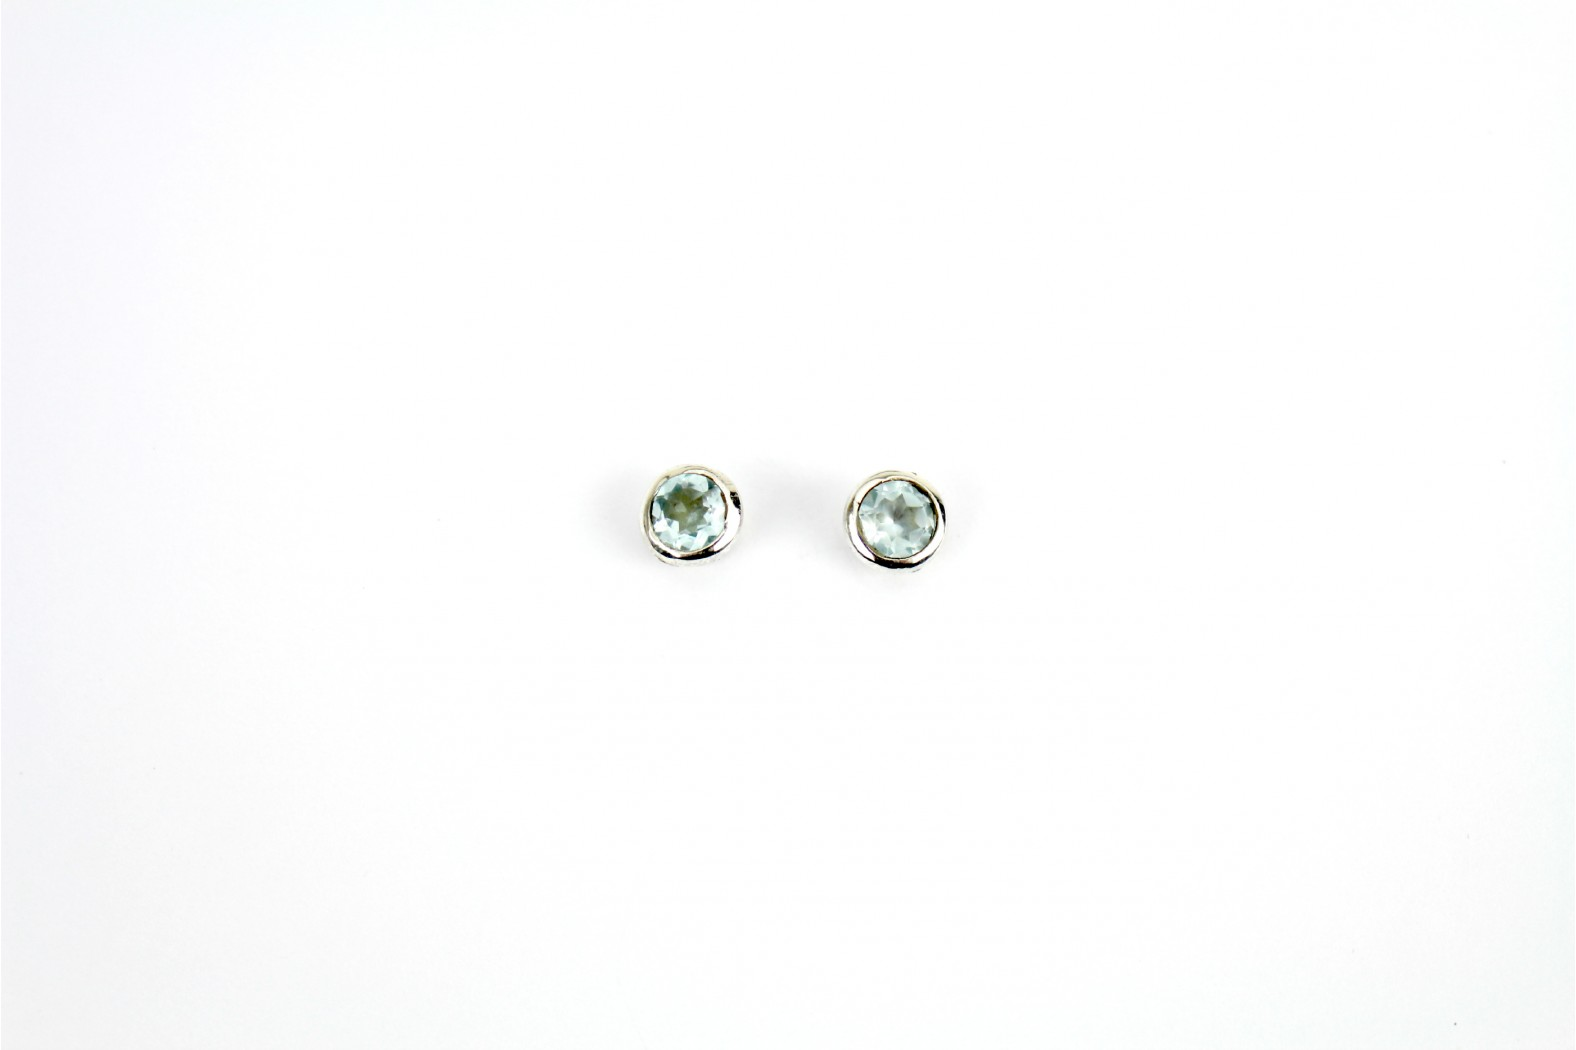 Circular Sky Blue Topaz stud earrings set in circular silver mounting